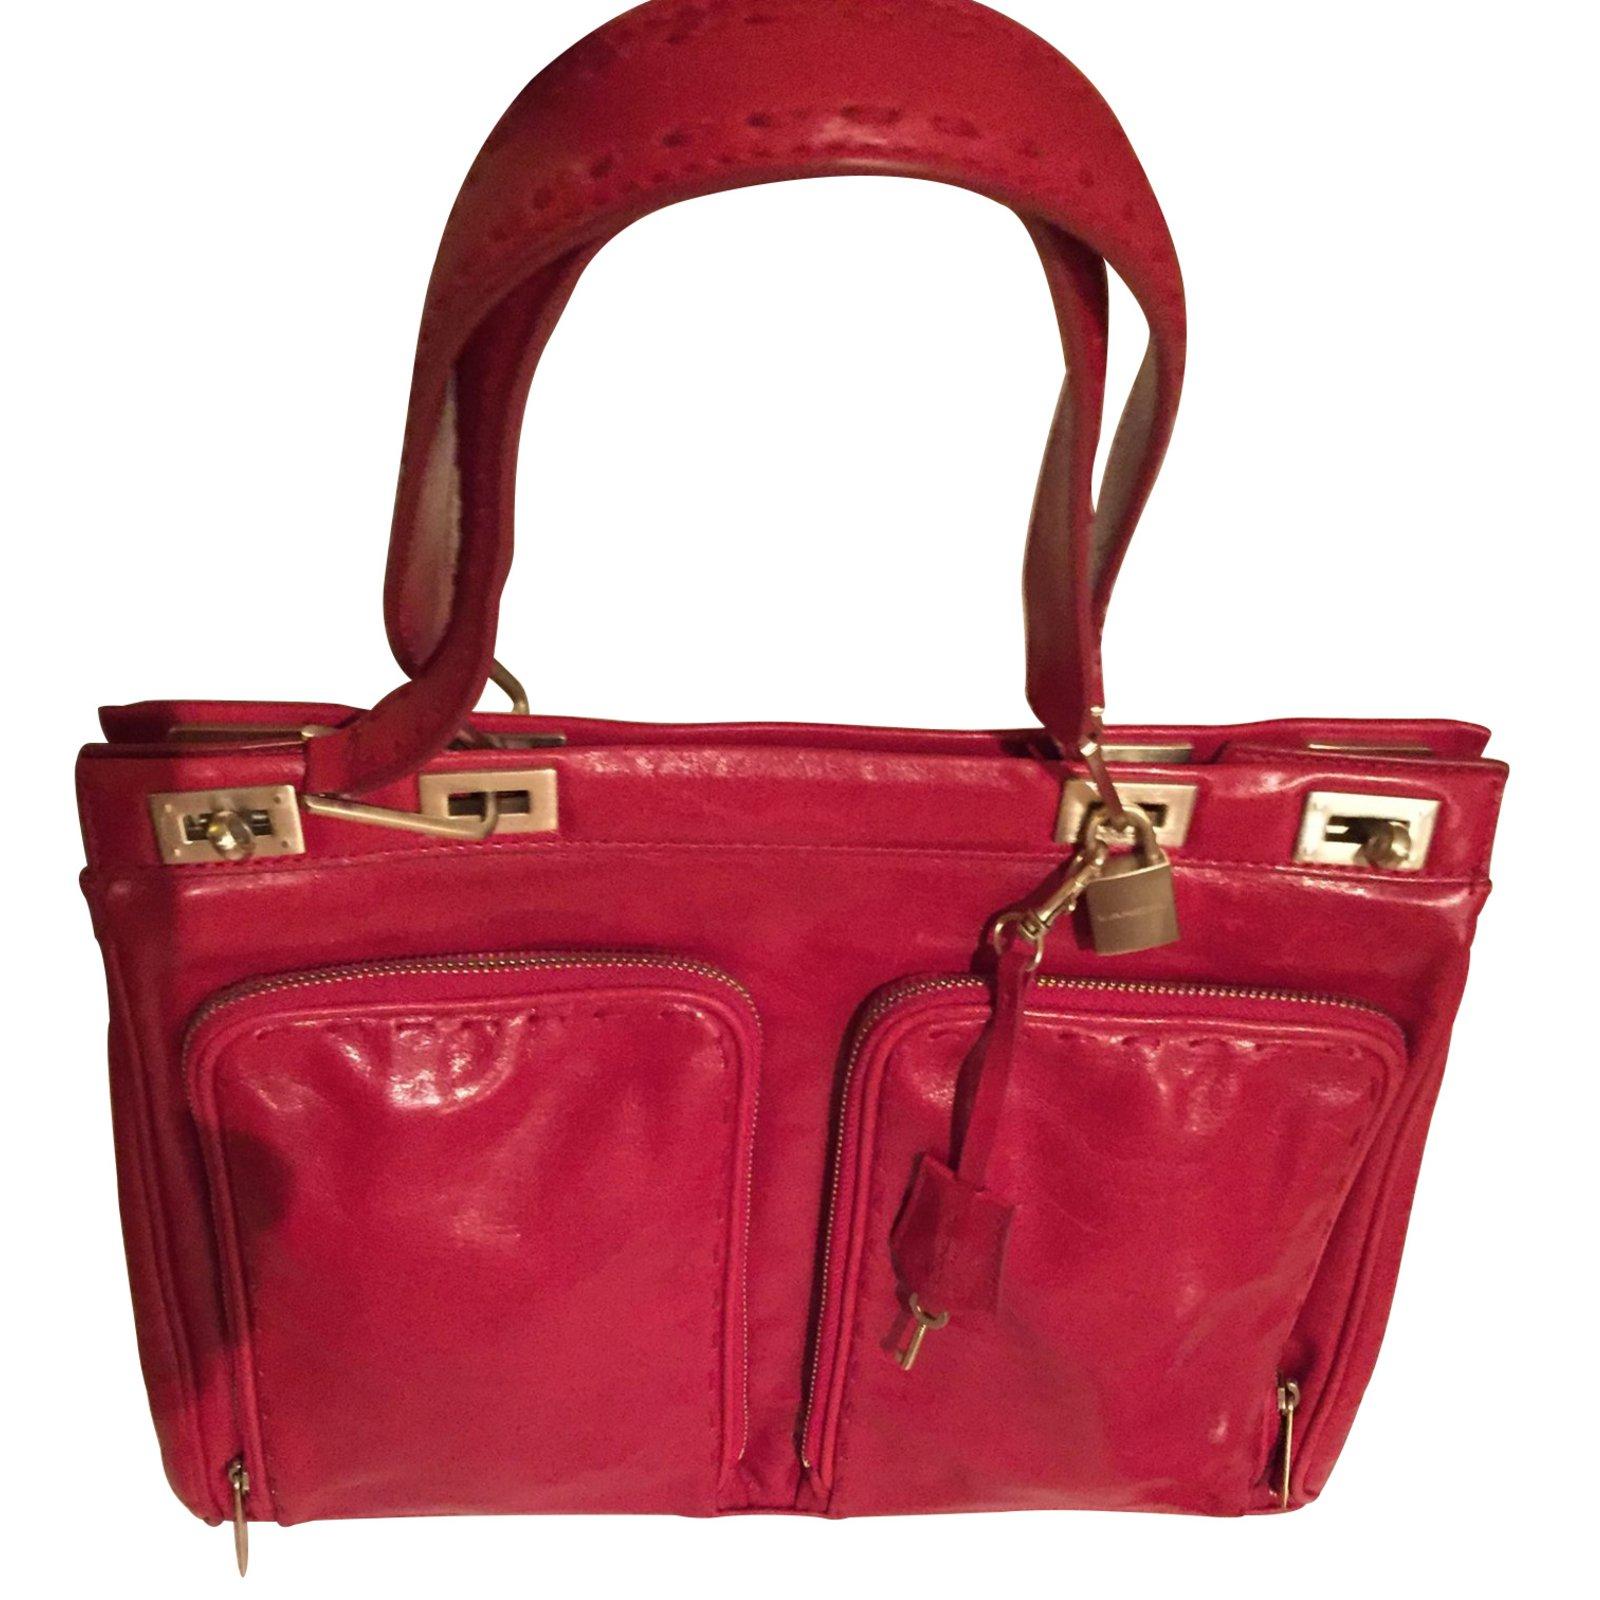 sacs main lancel sacs main cuir rouge joli. Black Bedroom Furniture Sets. Home Design Ideas